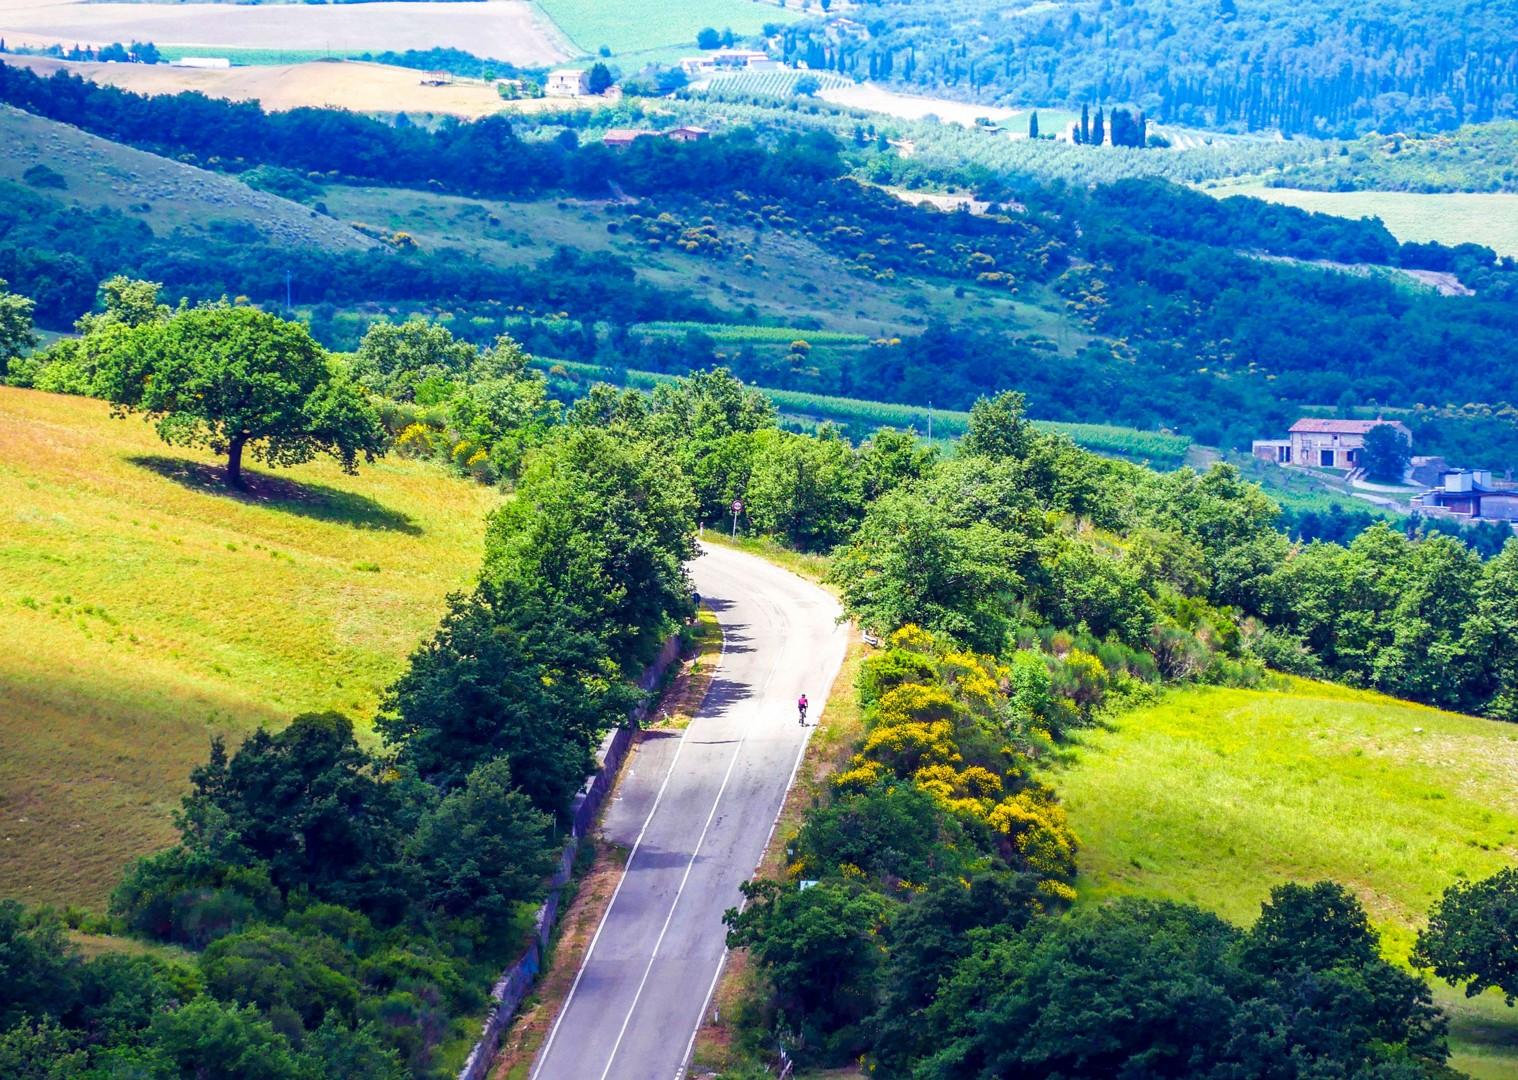 Solo.jpg - Italy - Tuscany - Giro della Toscana - Self-Guided Road Cycling Holiday - Road Cycling